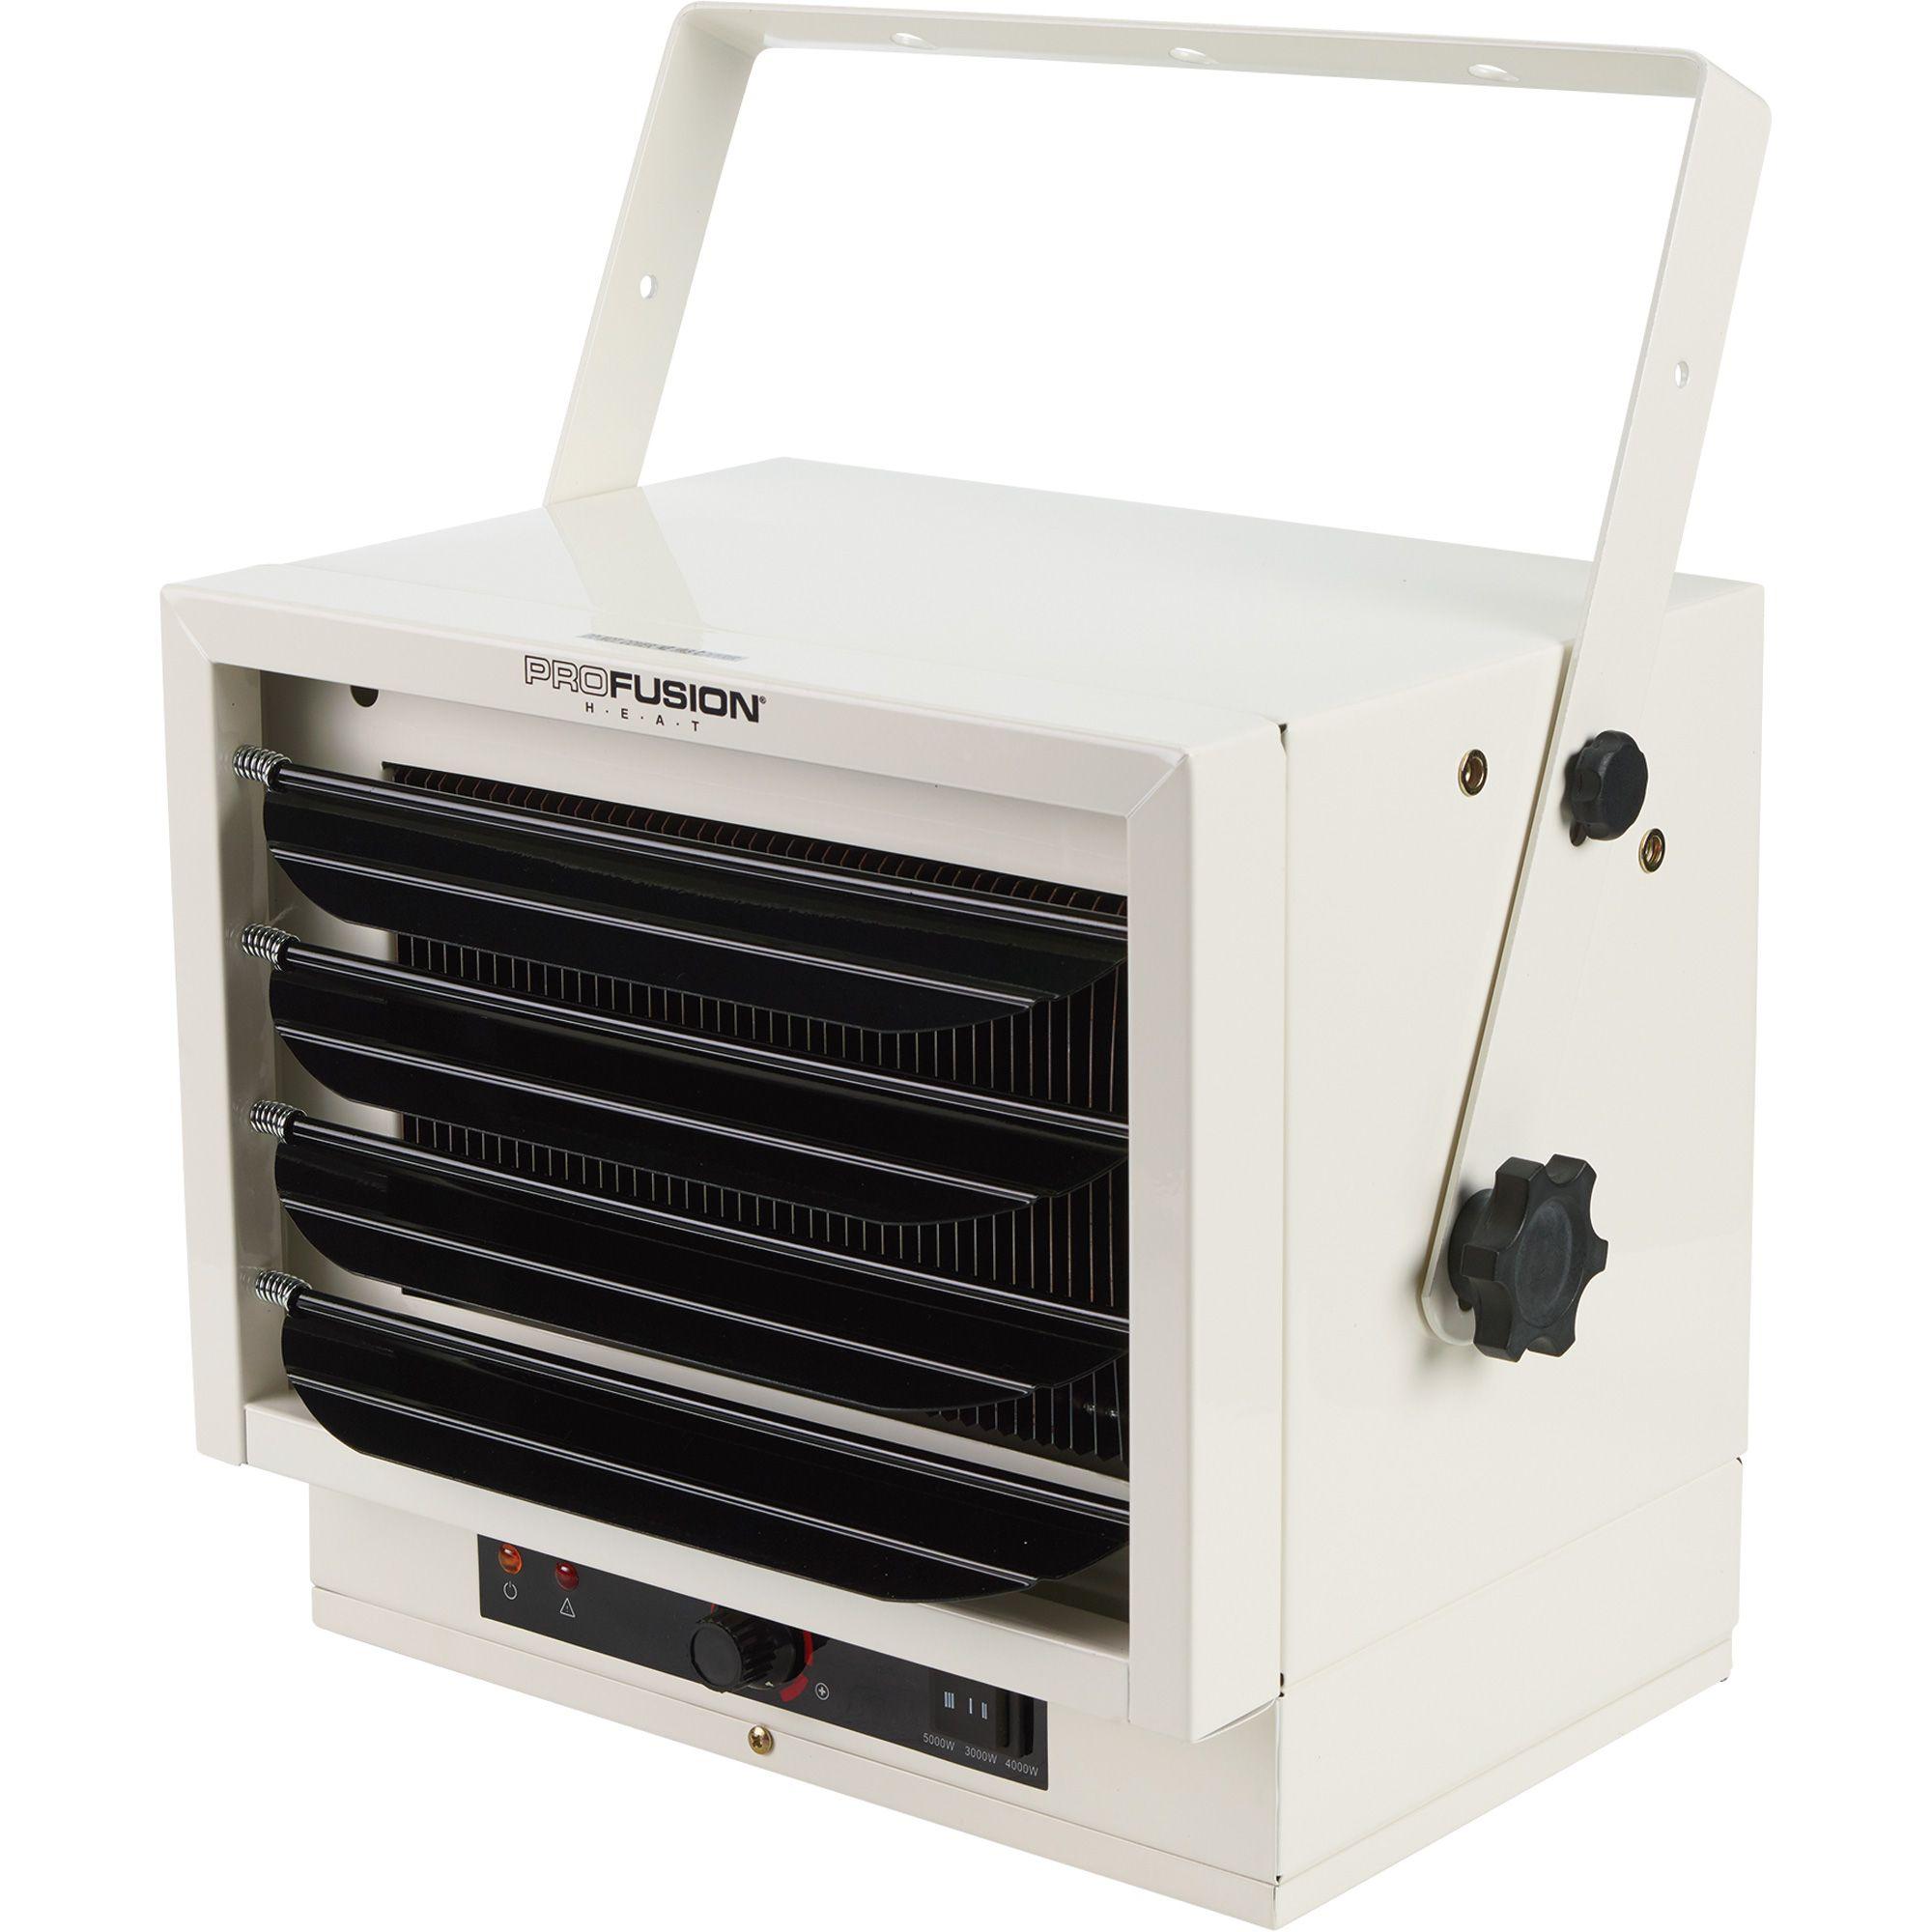 big model heater garage heaters amazon dp workshop maxx for mr btu gas natural com